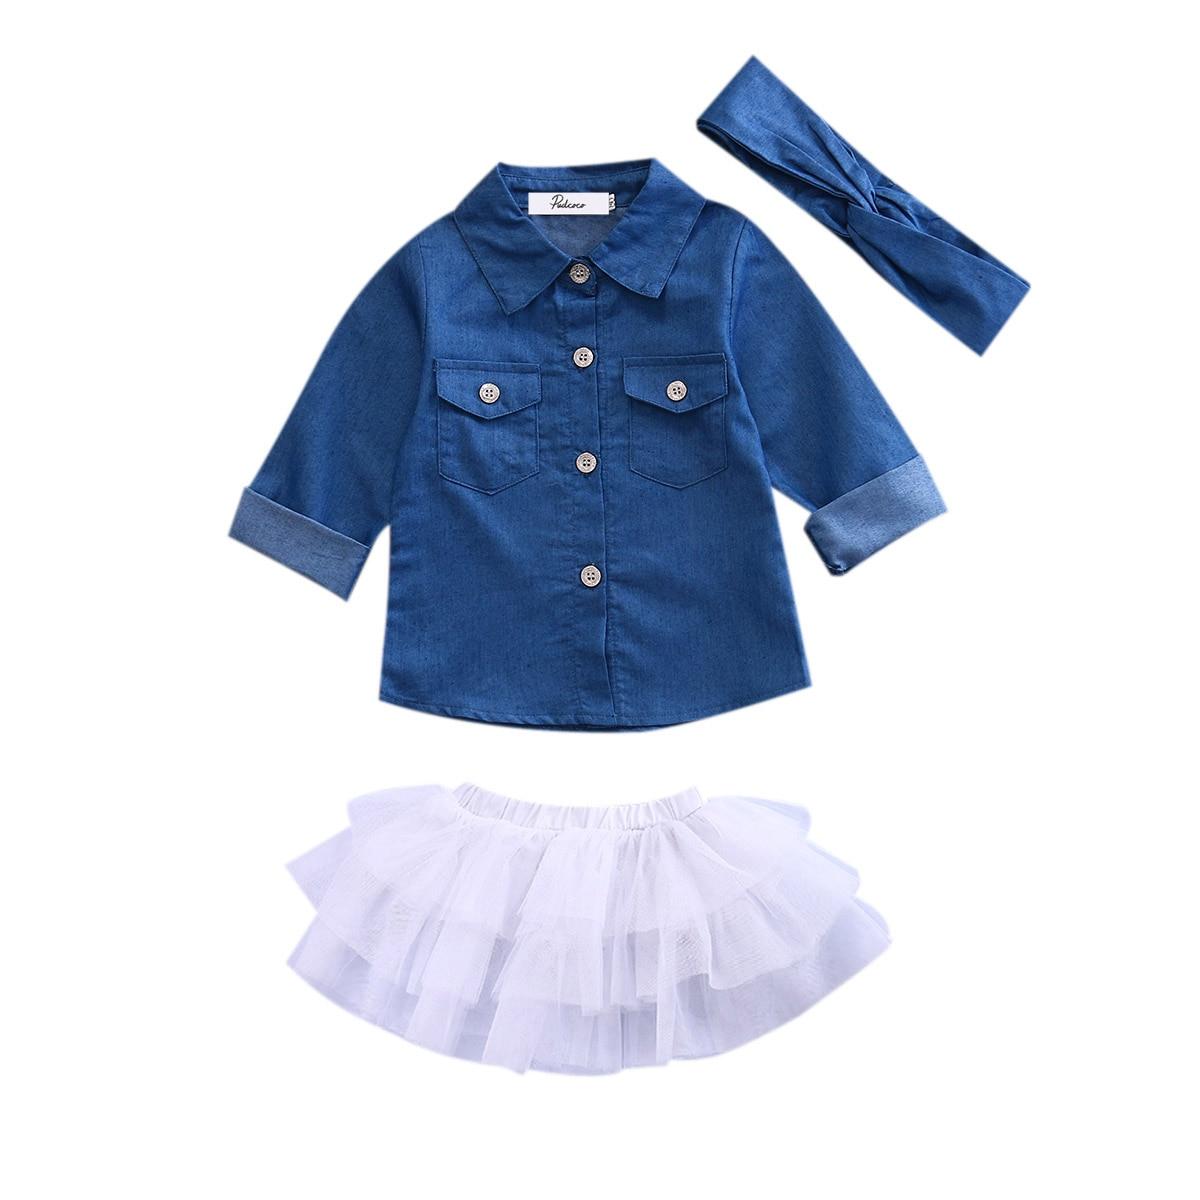 3PCS Toddler Kids Baby Girl Clothes Set Denim Tops T-shirt +Tutu Skirt Headband Outfits Summer Cowboy Suit Children Set 0-5Y